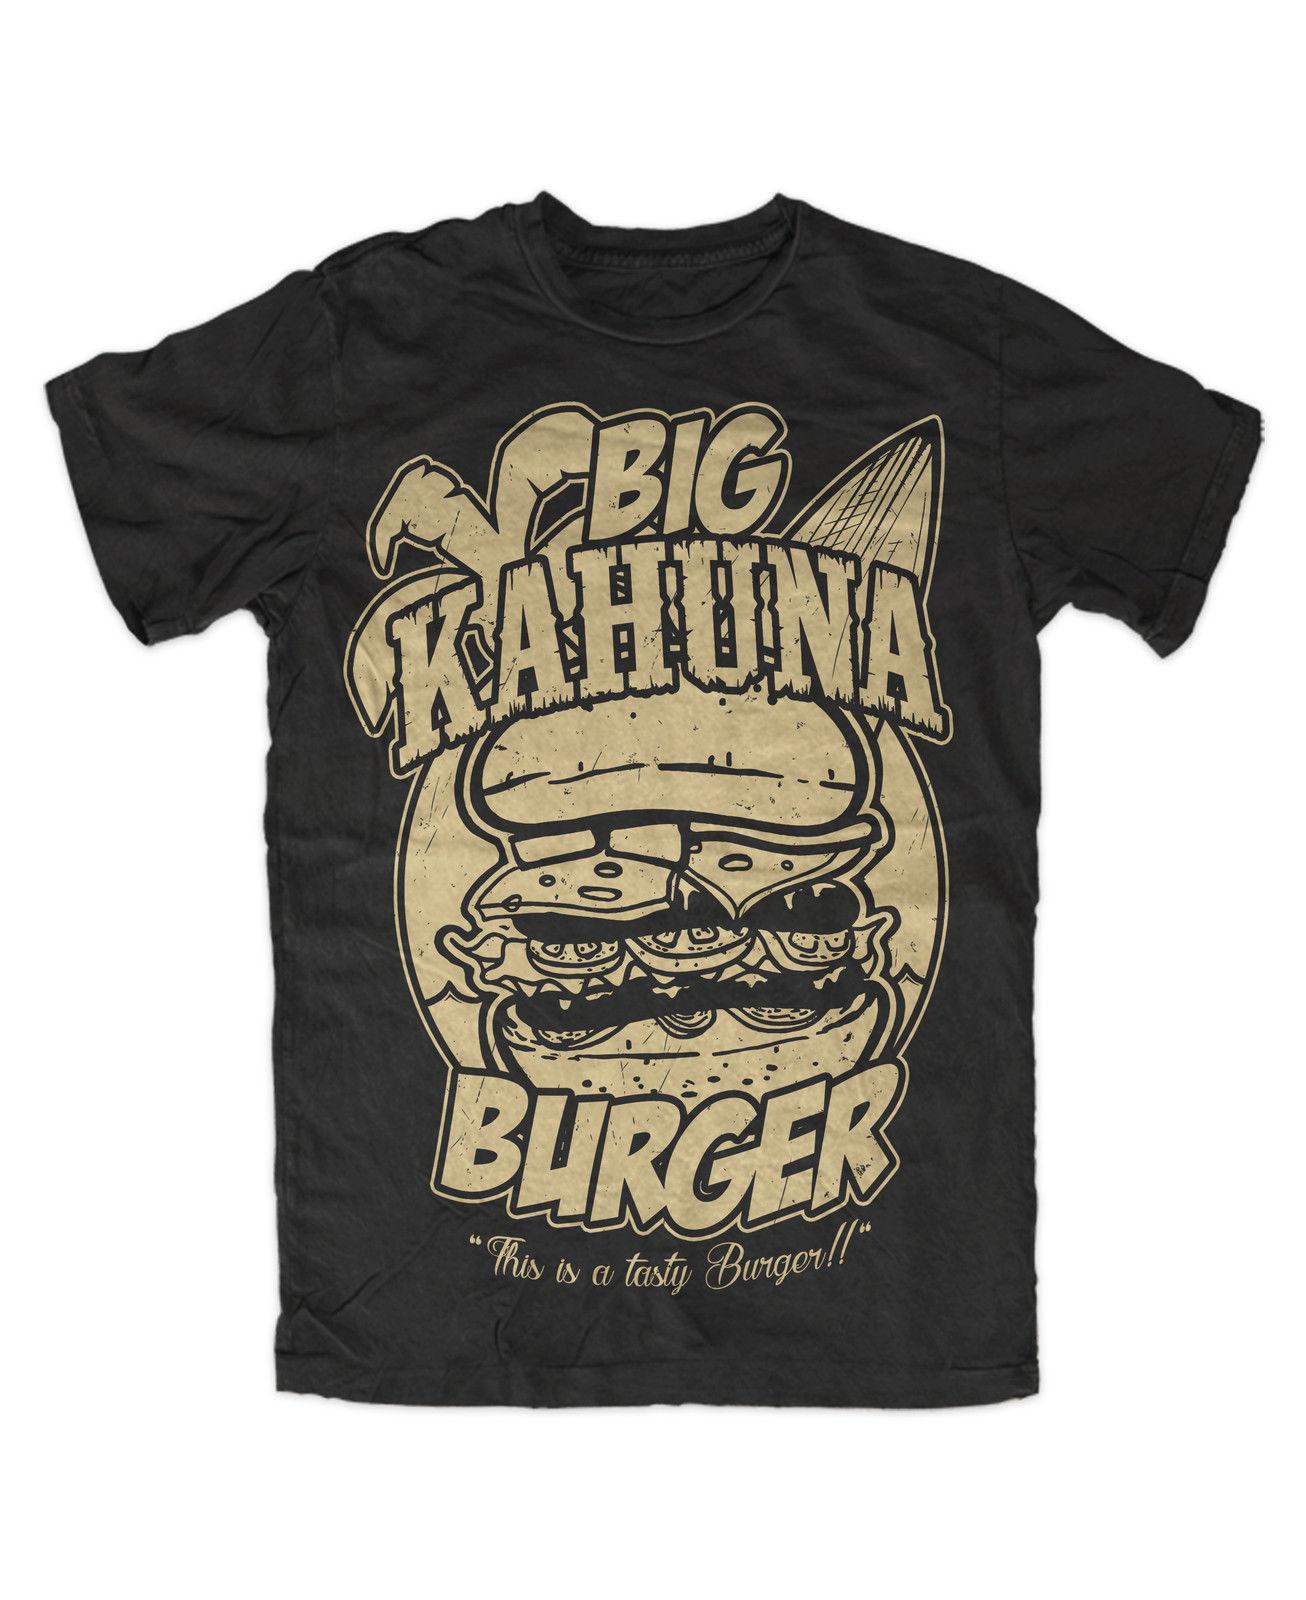 big-kahuna-burger-m2-t-shirt-jules-winnfield-font-b-tarantino-b-font-pulp-fiction-movie-sleeve-t-shirt-summer-men-tee-tops-clothing